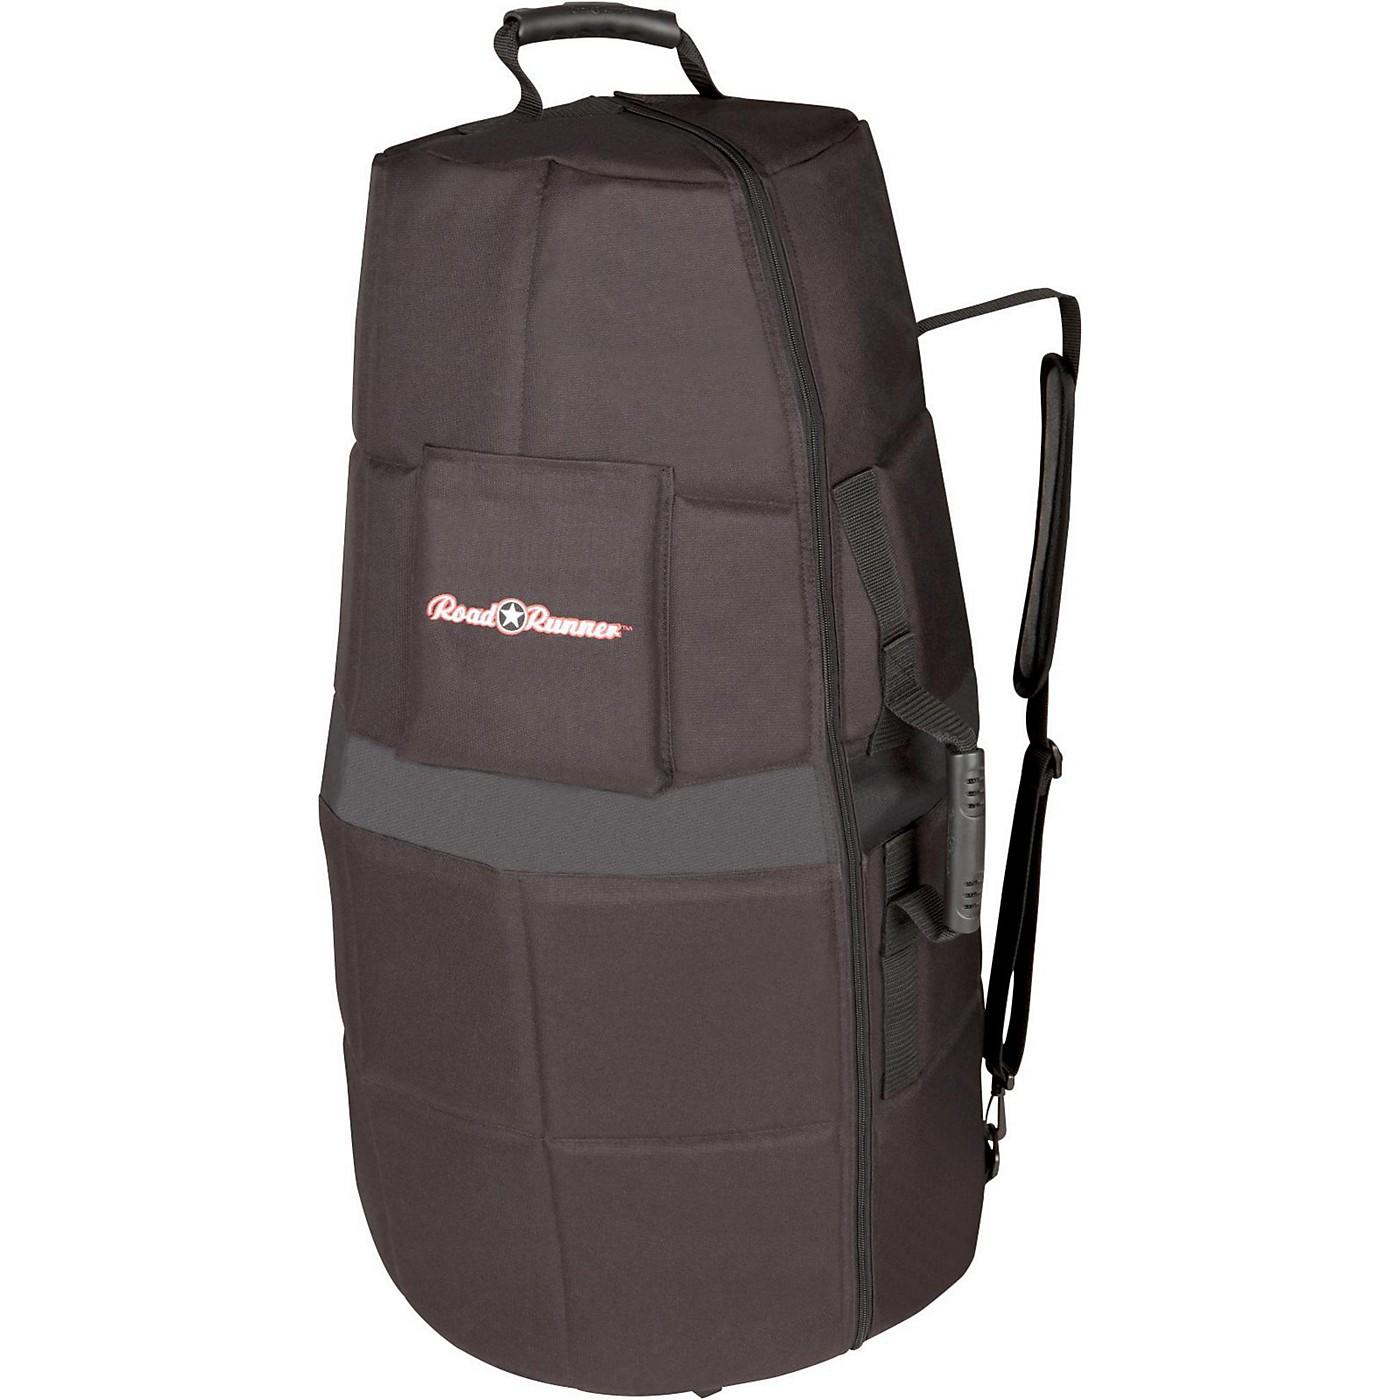 Road Runner RRKCNG Conga Bag With Wheels thumbnail